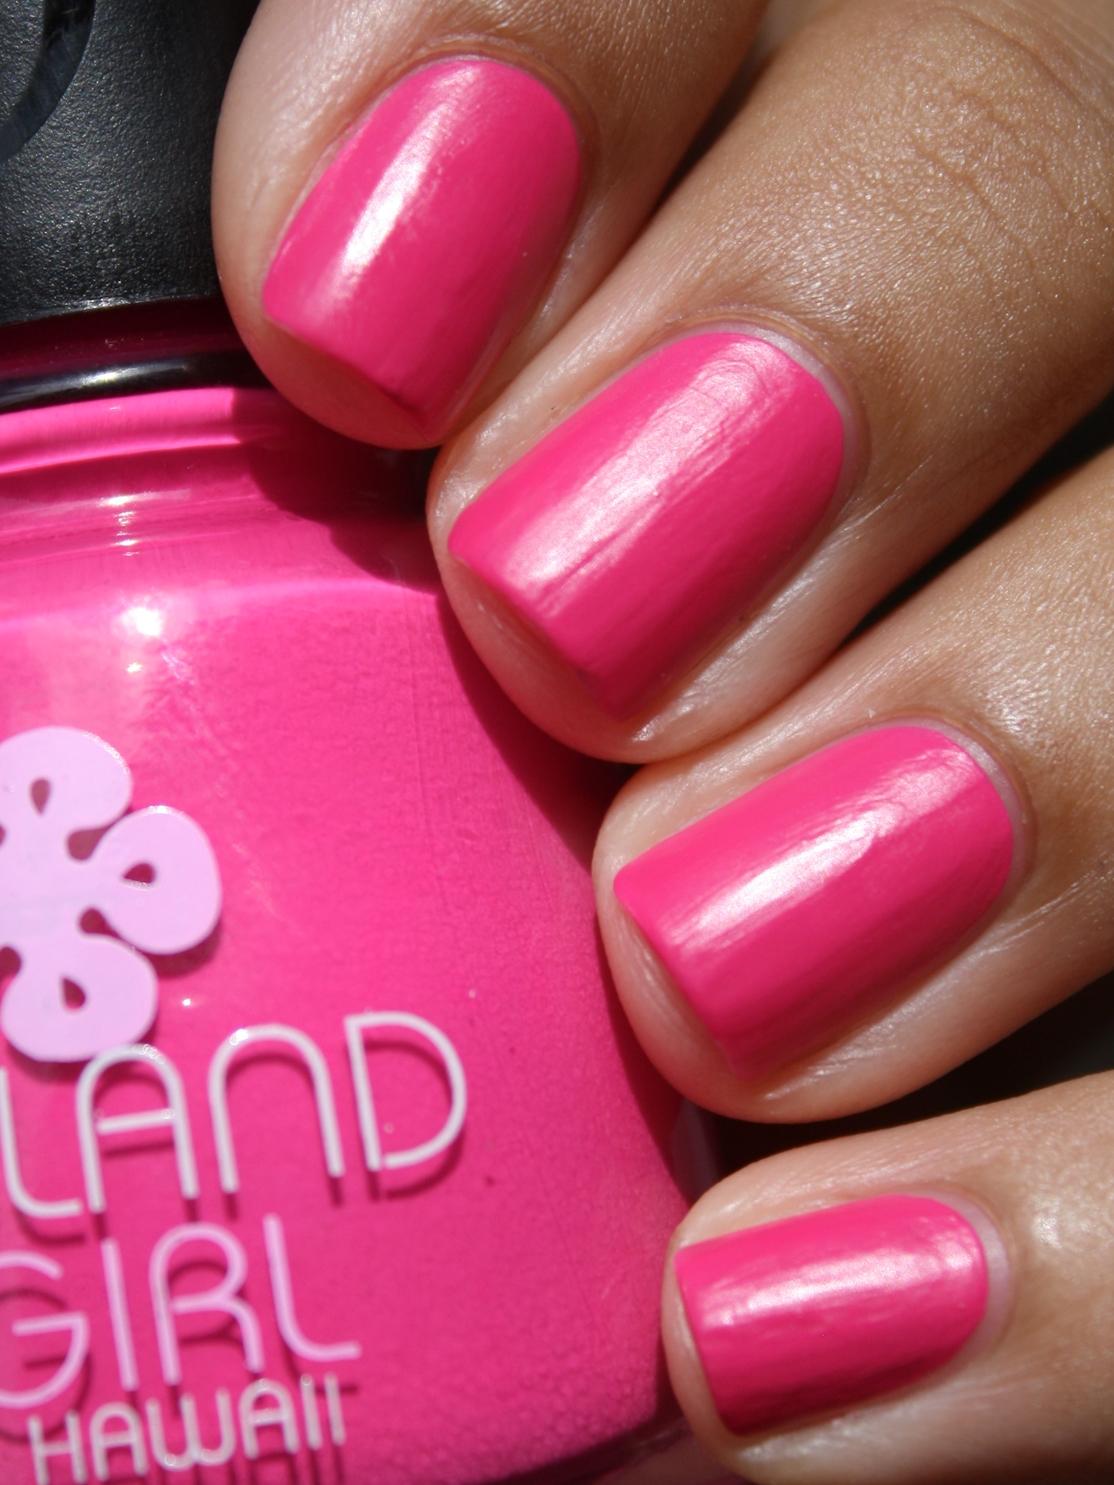 Mommy Needs A Manicure Stat.: Island Girl Nail Polish: My